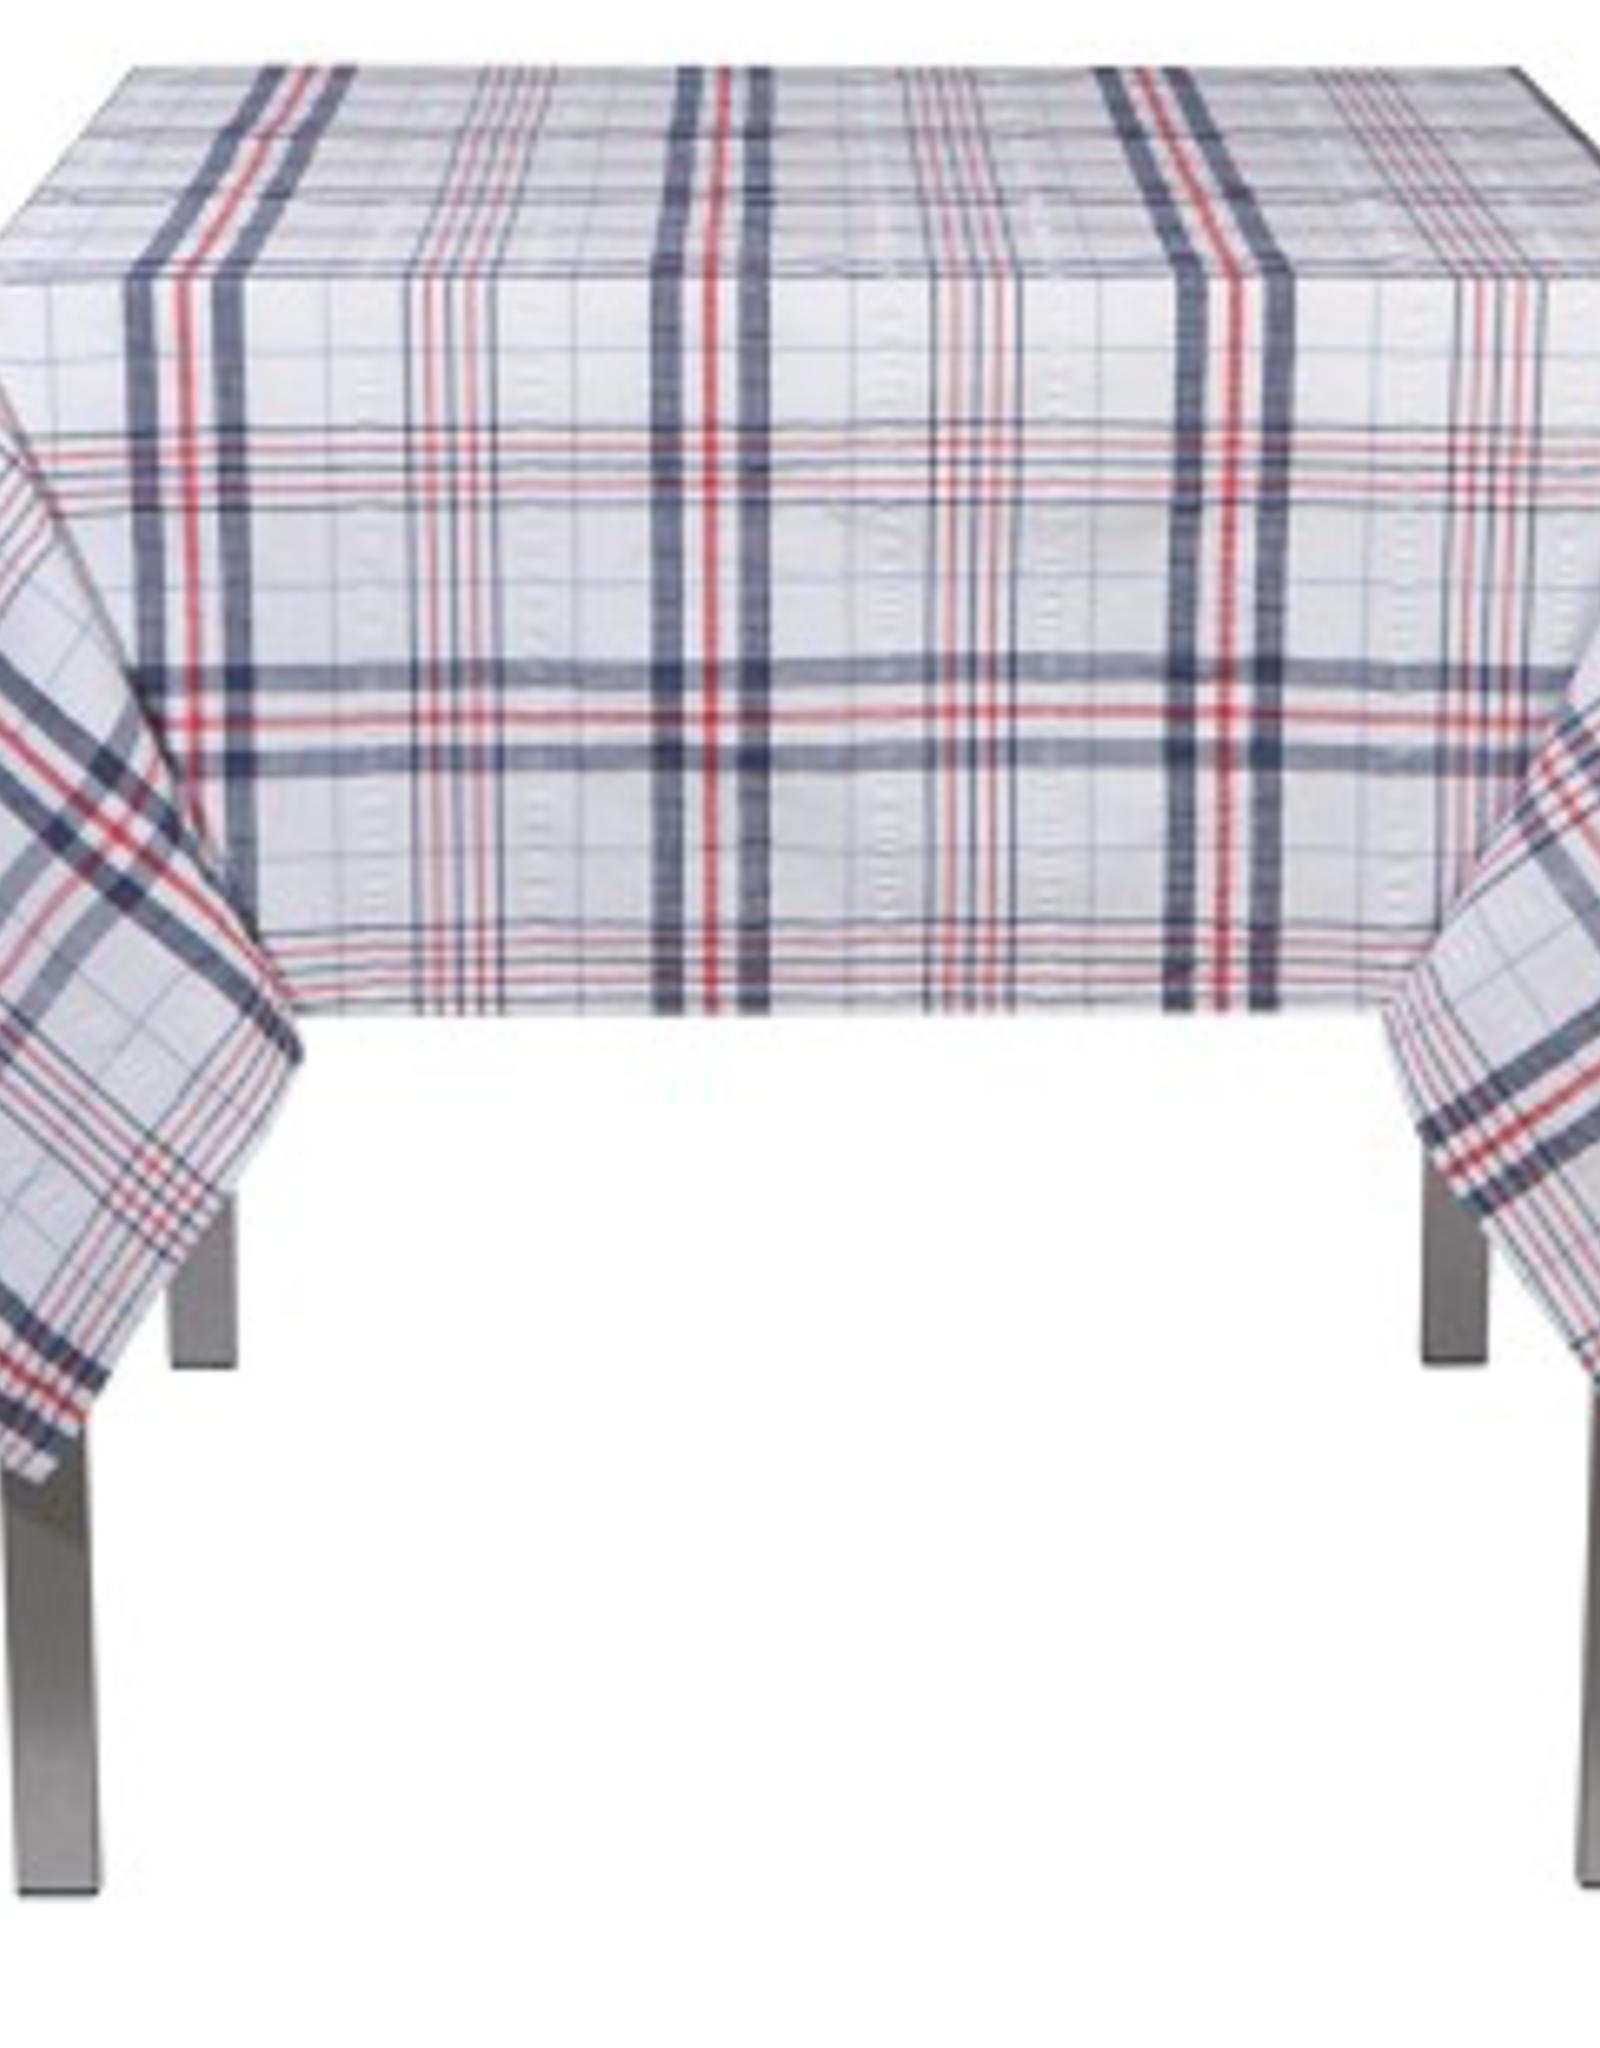 Danica Danica Seersucker Tablecloth 60x120